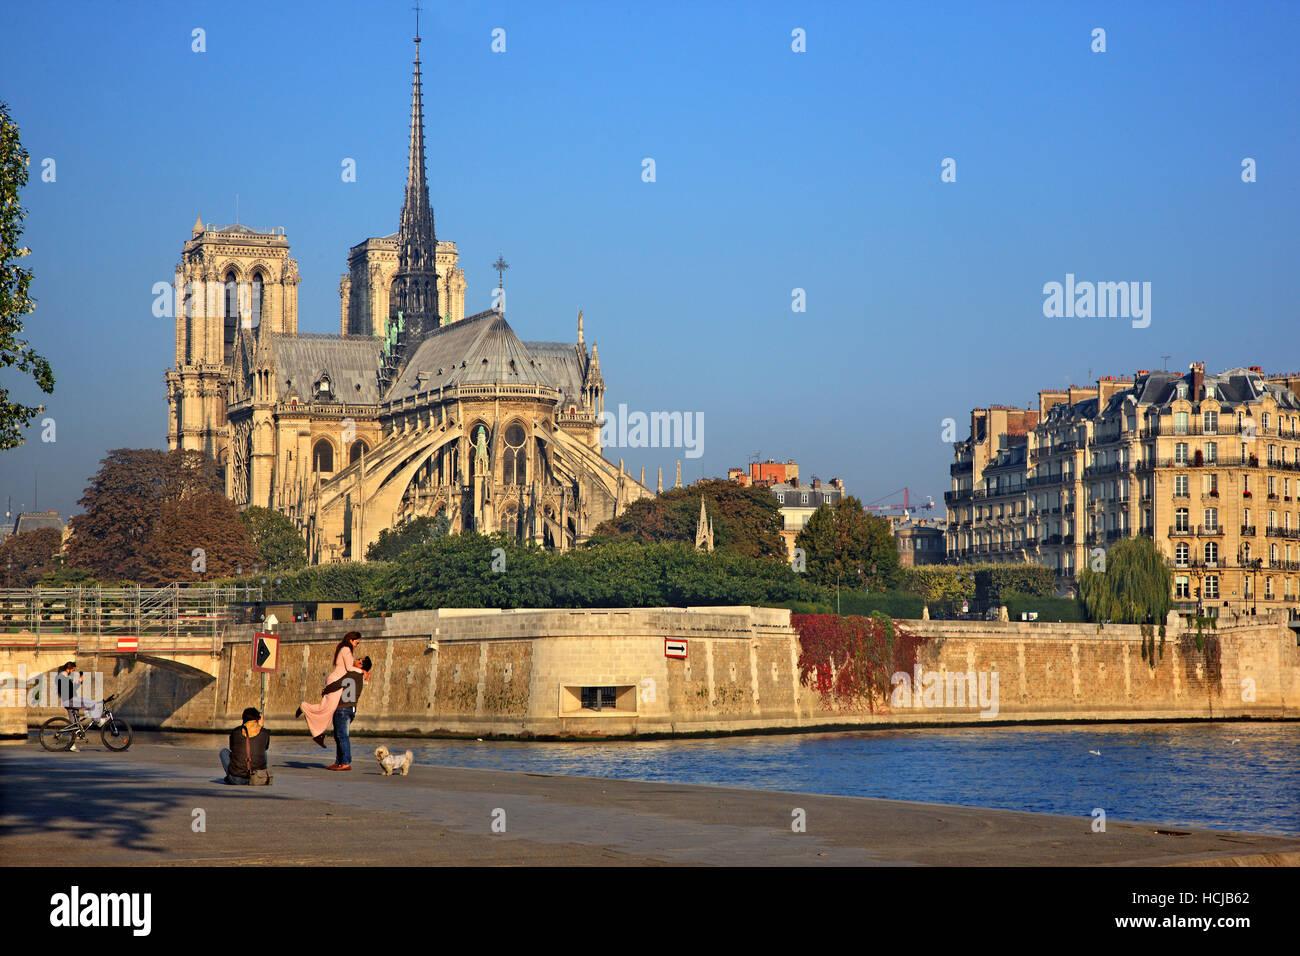 Paar immer fotografiert vor der Kathedrale Notre Dame, Paris, Frankreich. Stockbild